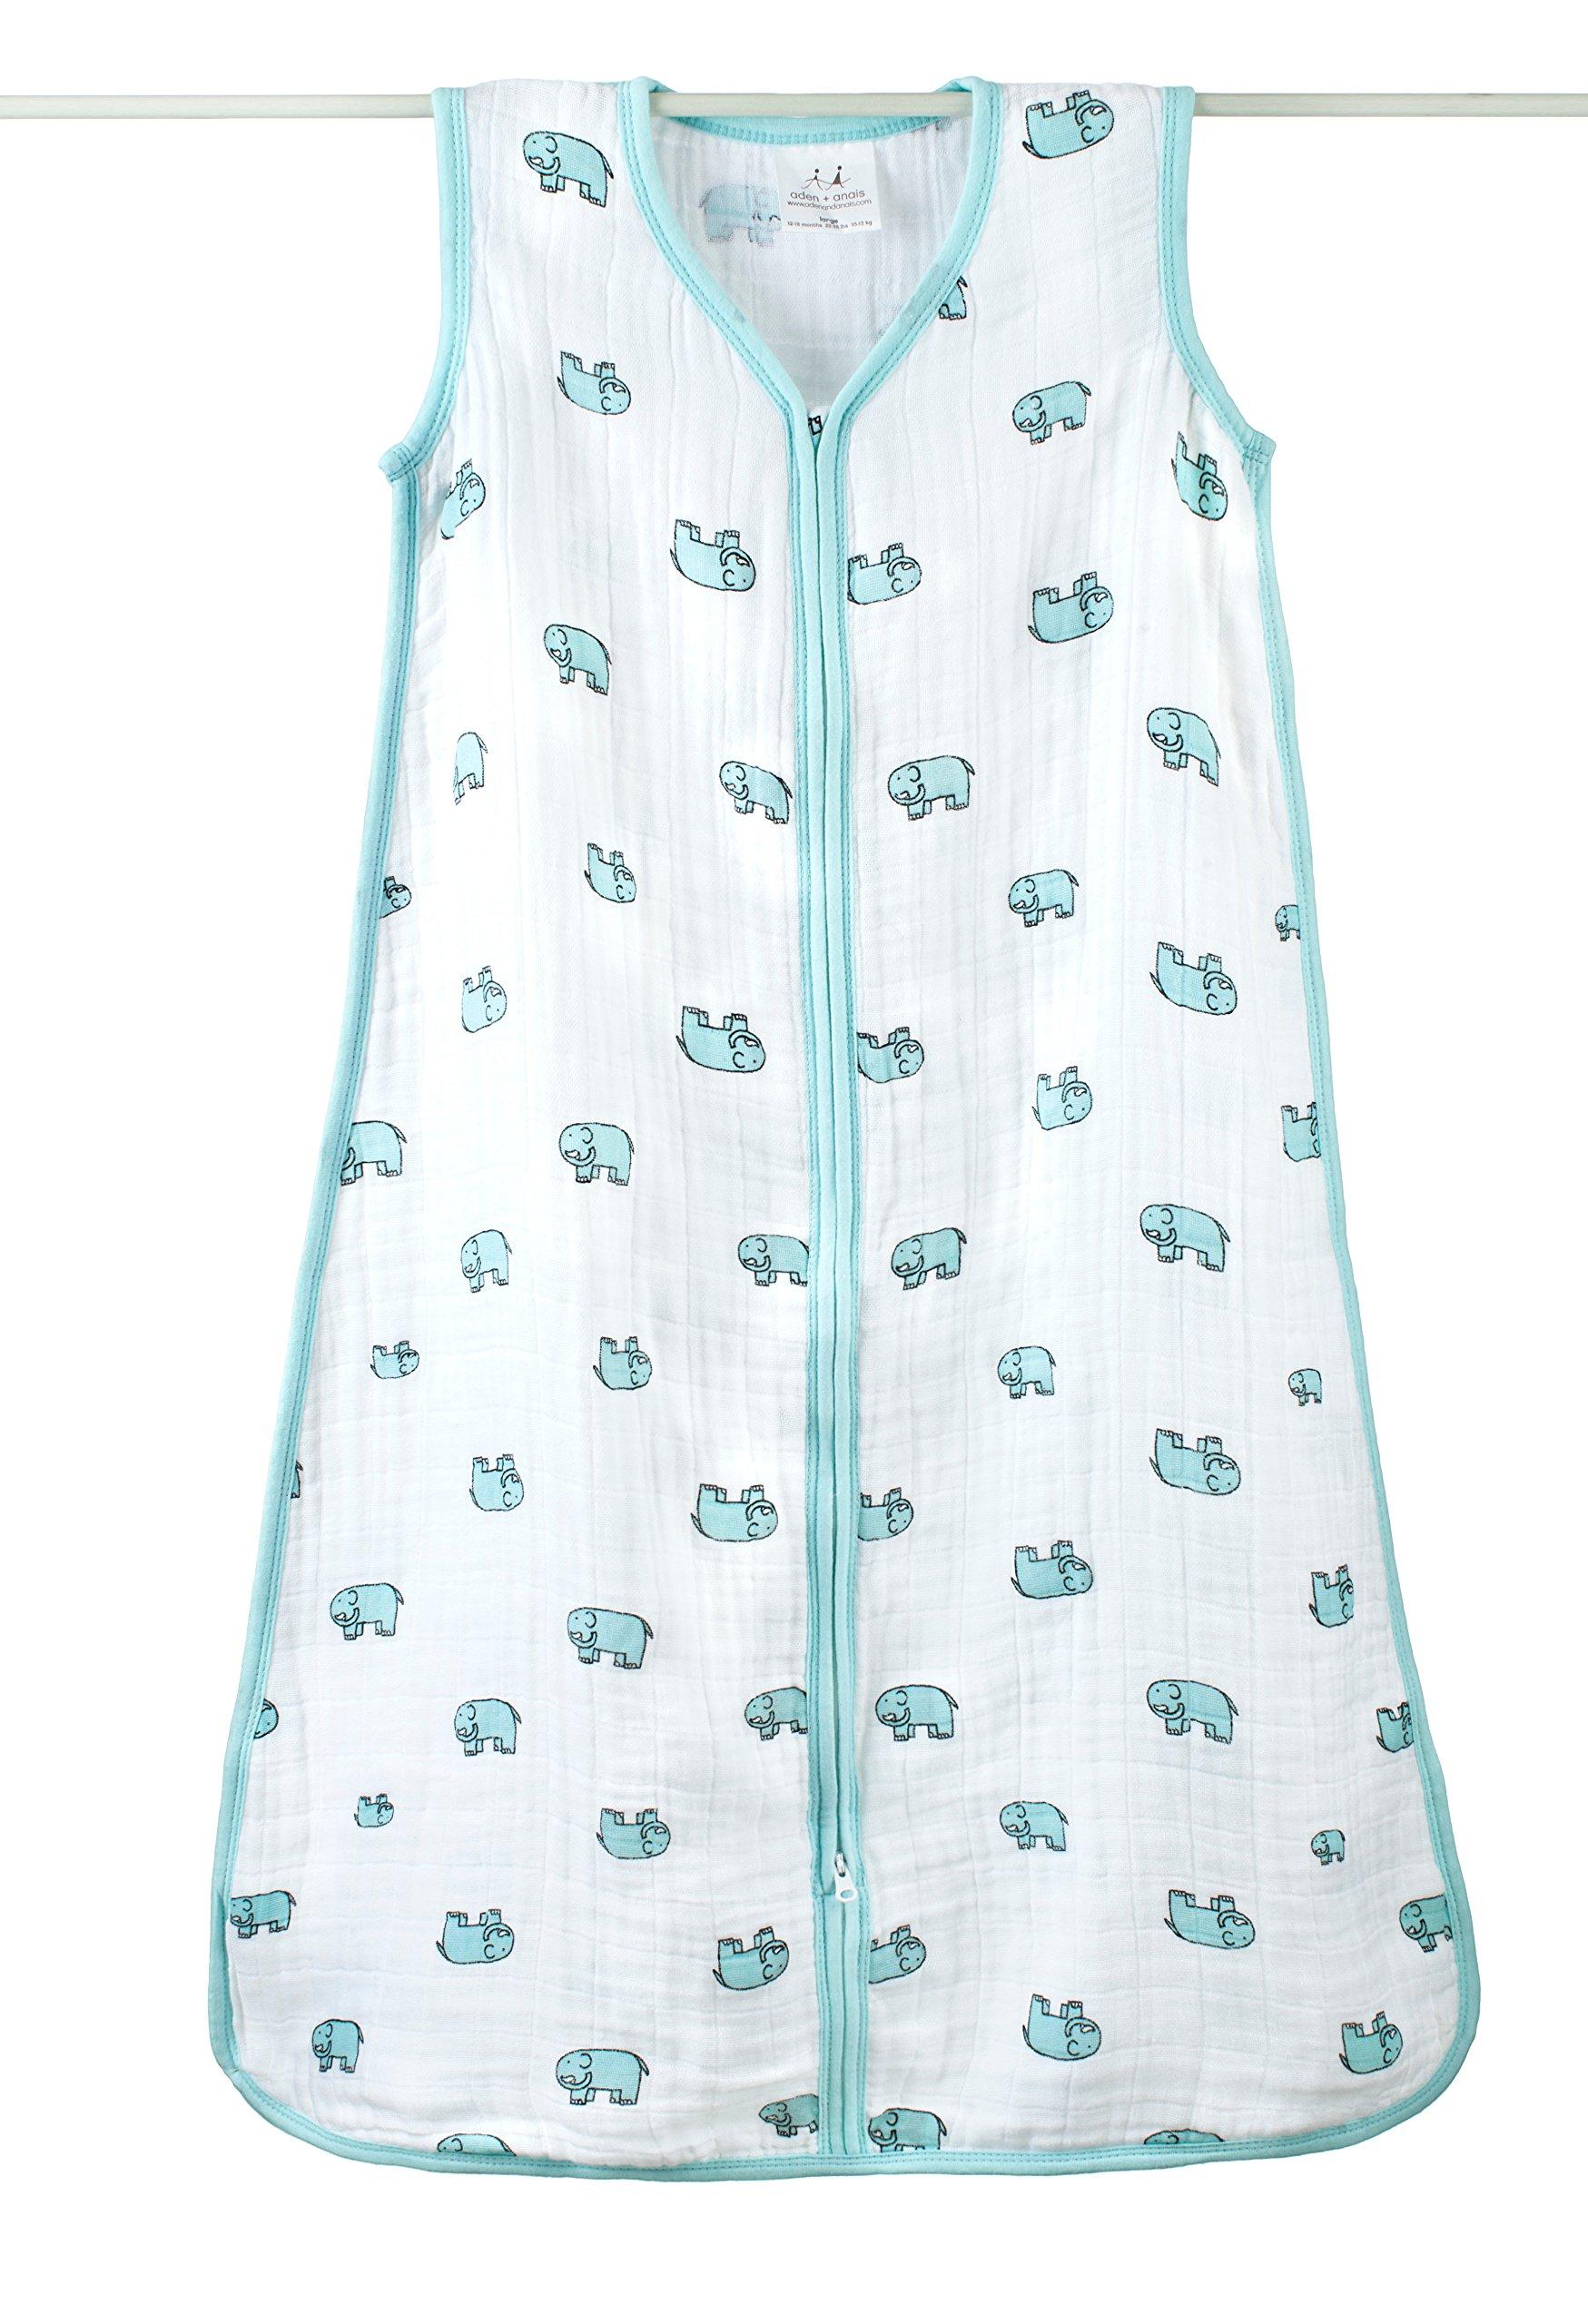 aden + anais Classic Sleeping Bag, 100% Cotton Muslin, Wearable Baby Blanket,